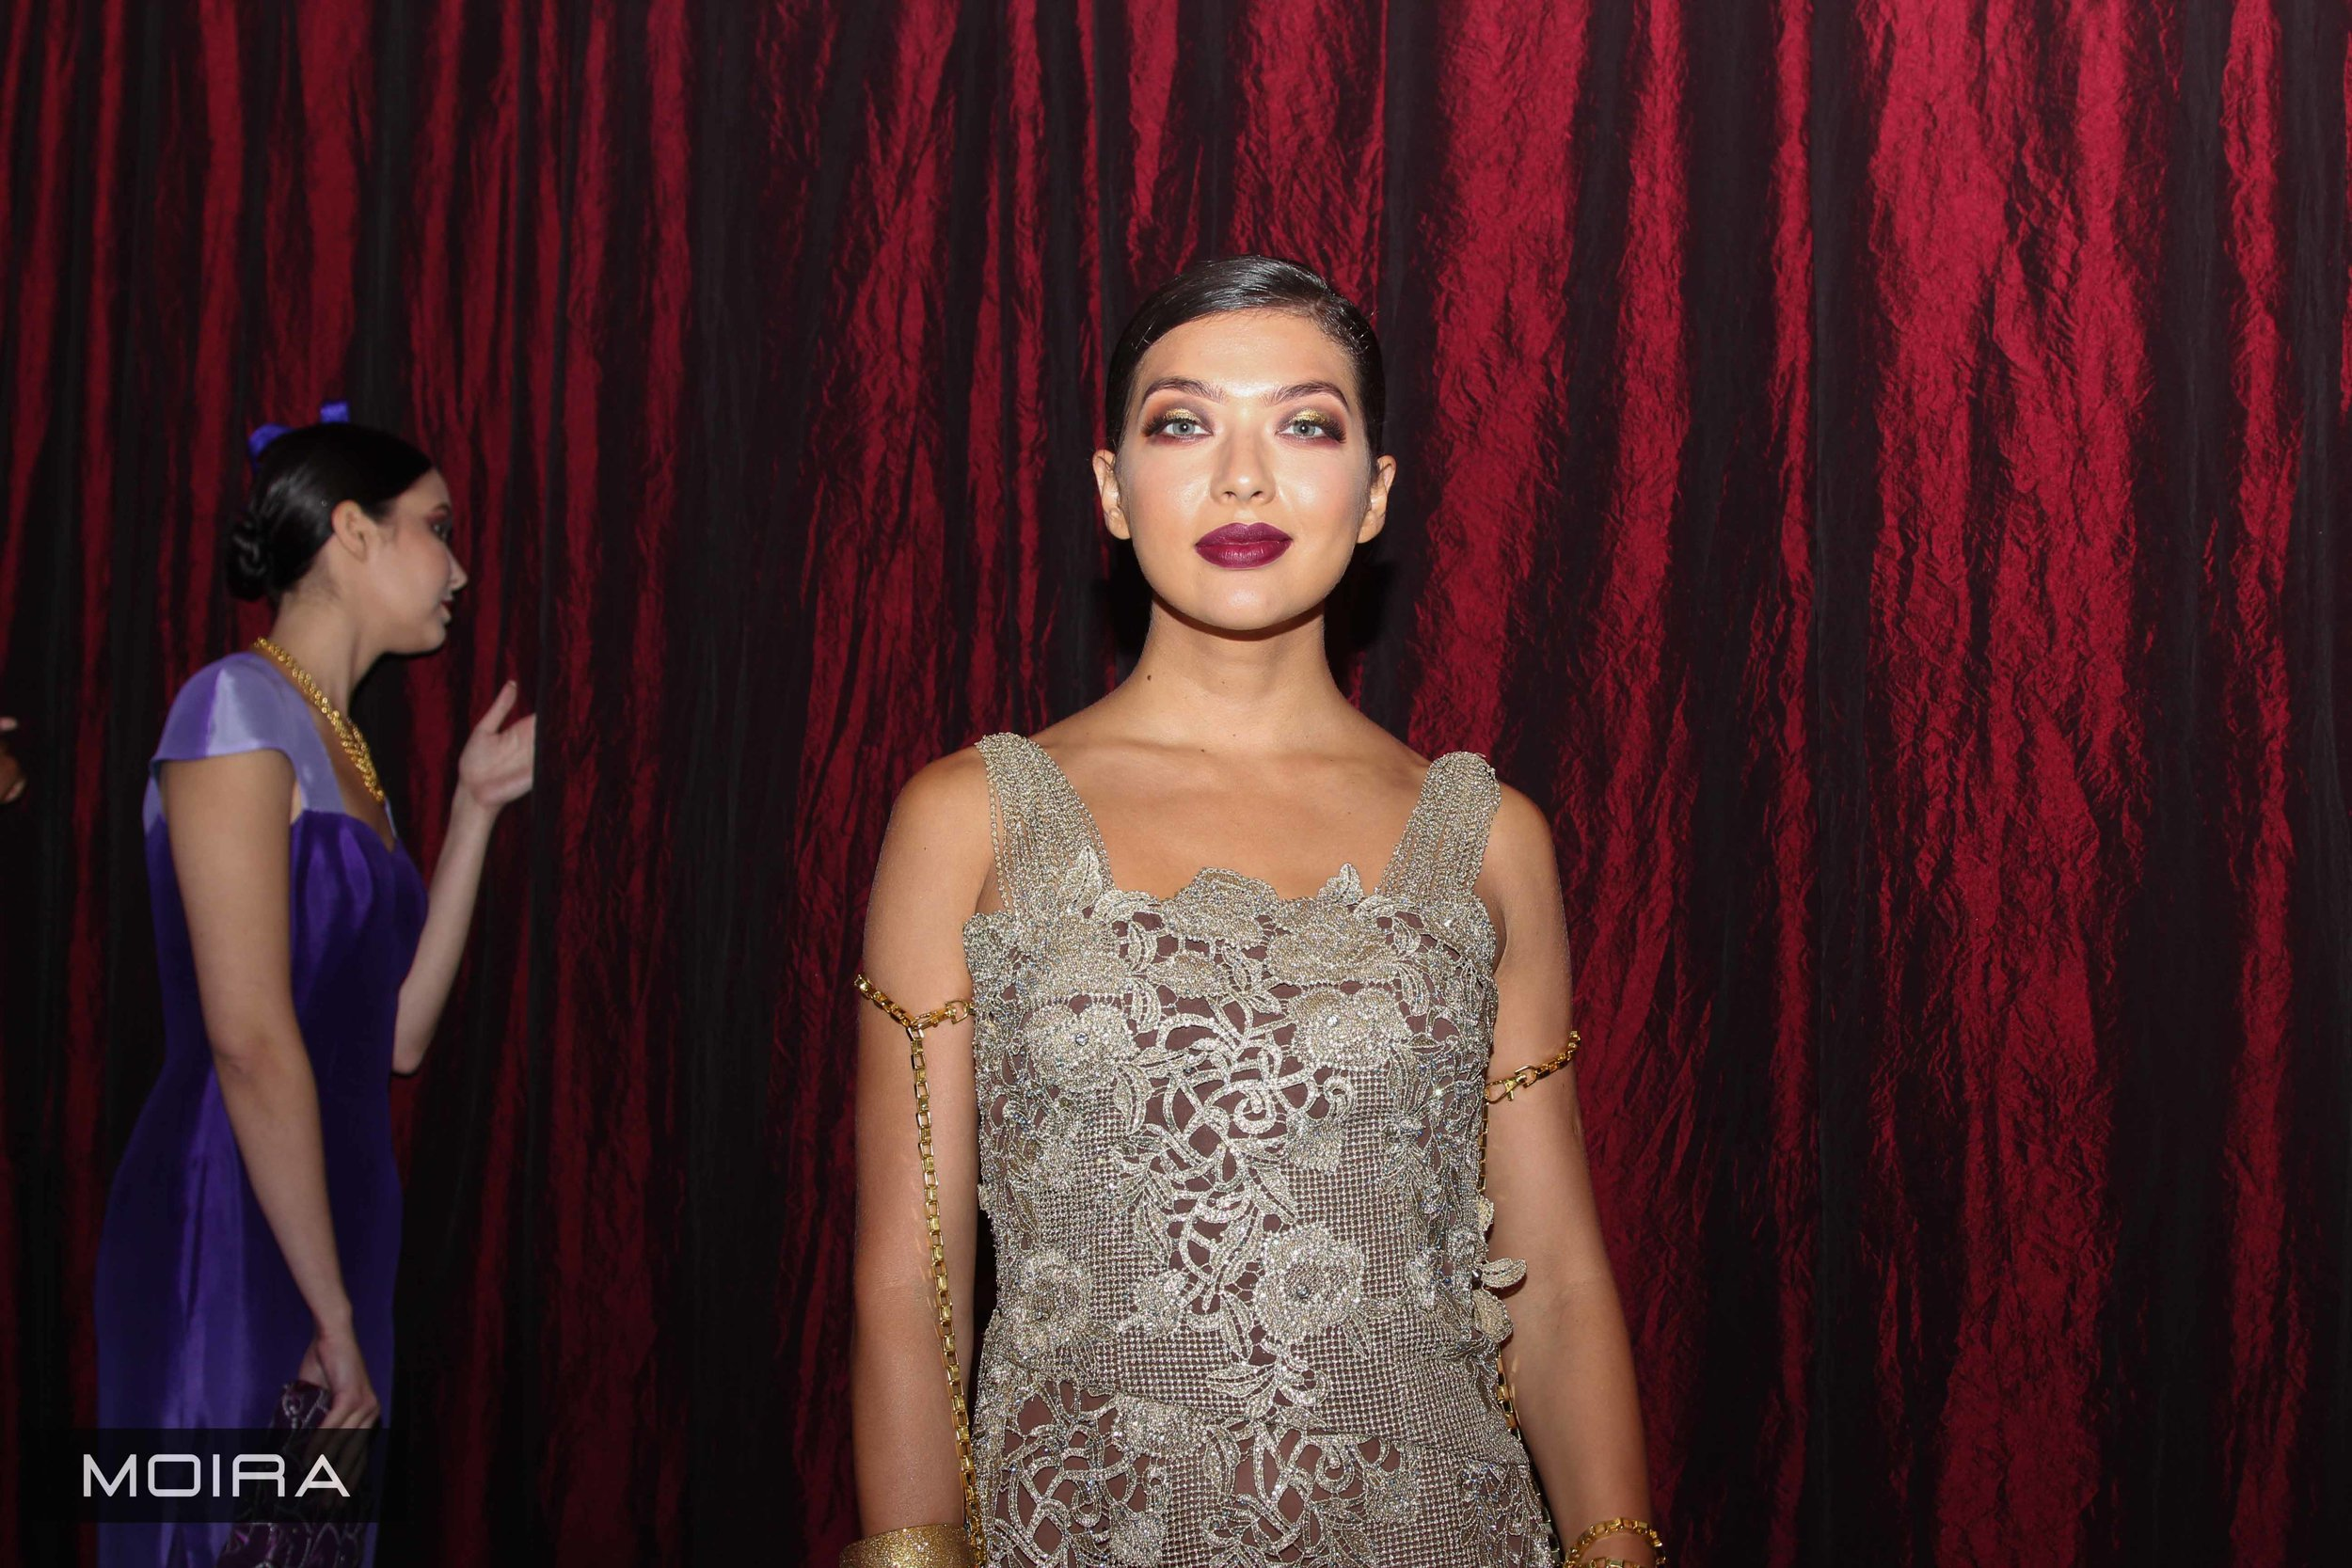 MOIRA_Cosmetics_New_York_Fashion_Week_2018-54.jpg